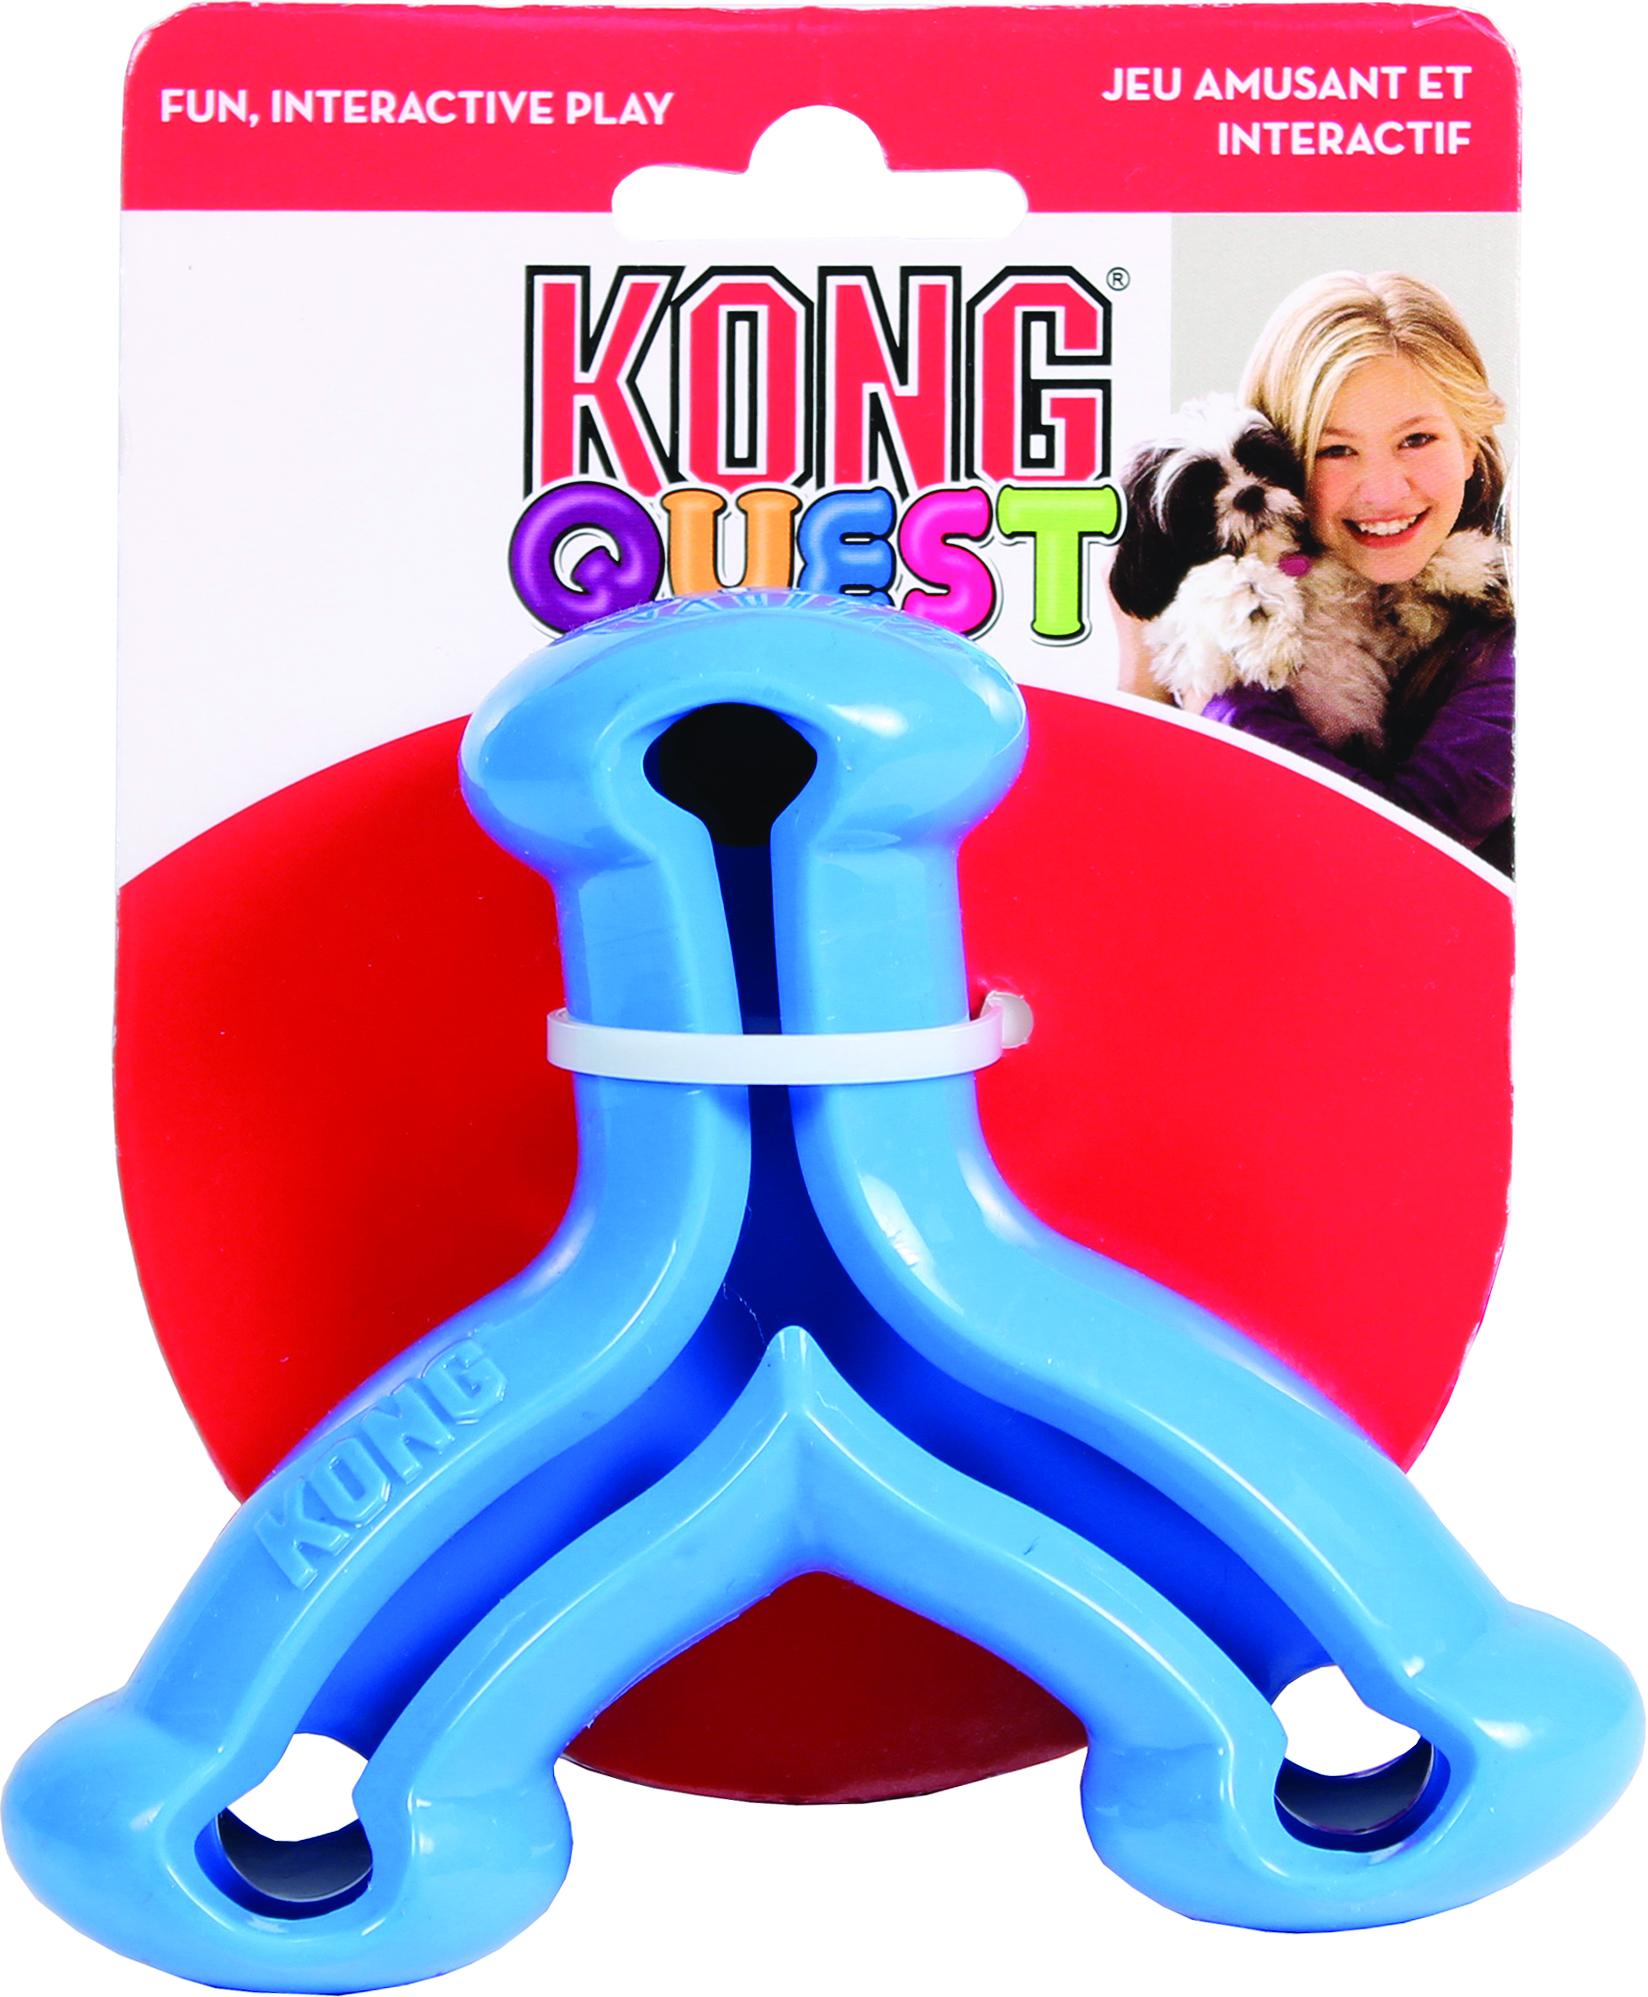 KONG Quest Wishbone